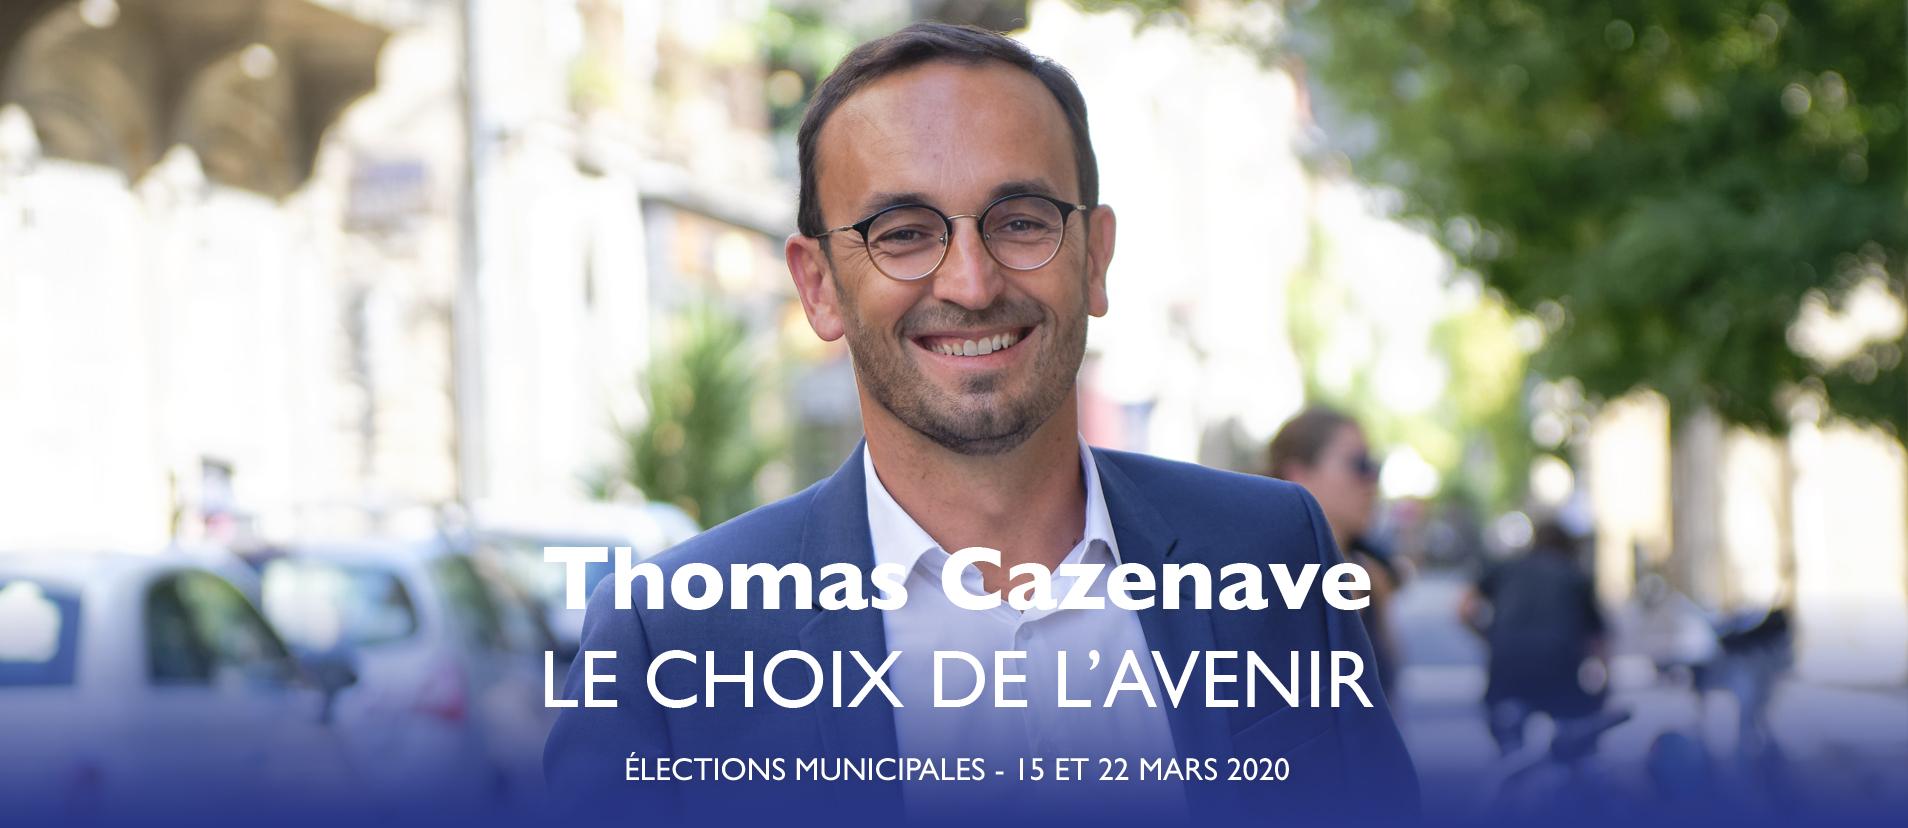 Thomas Cazenave